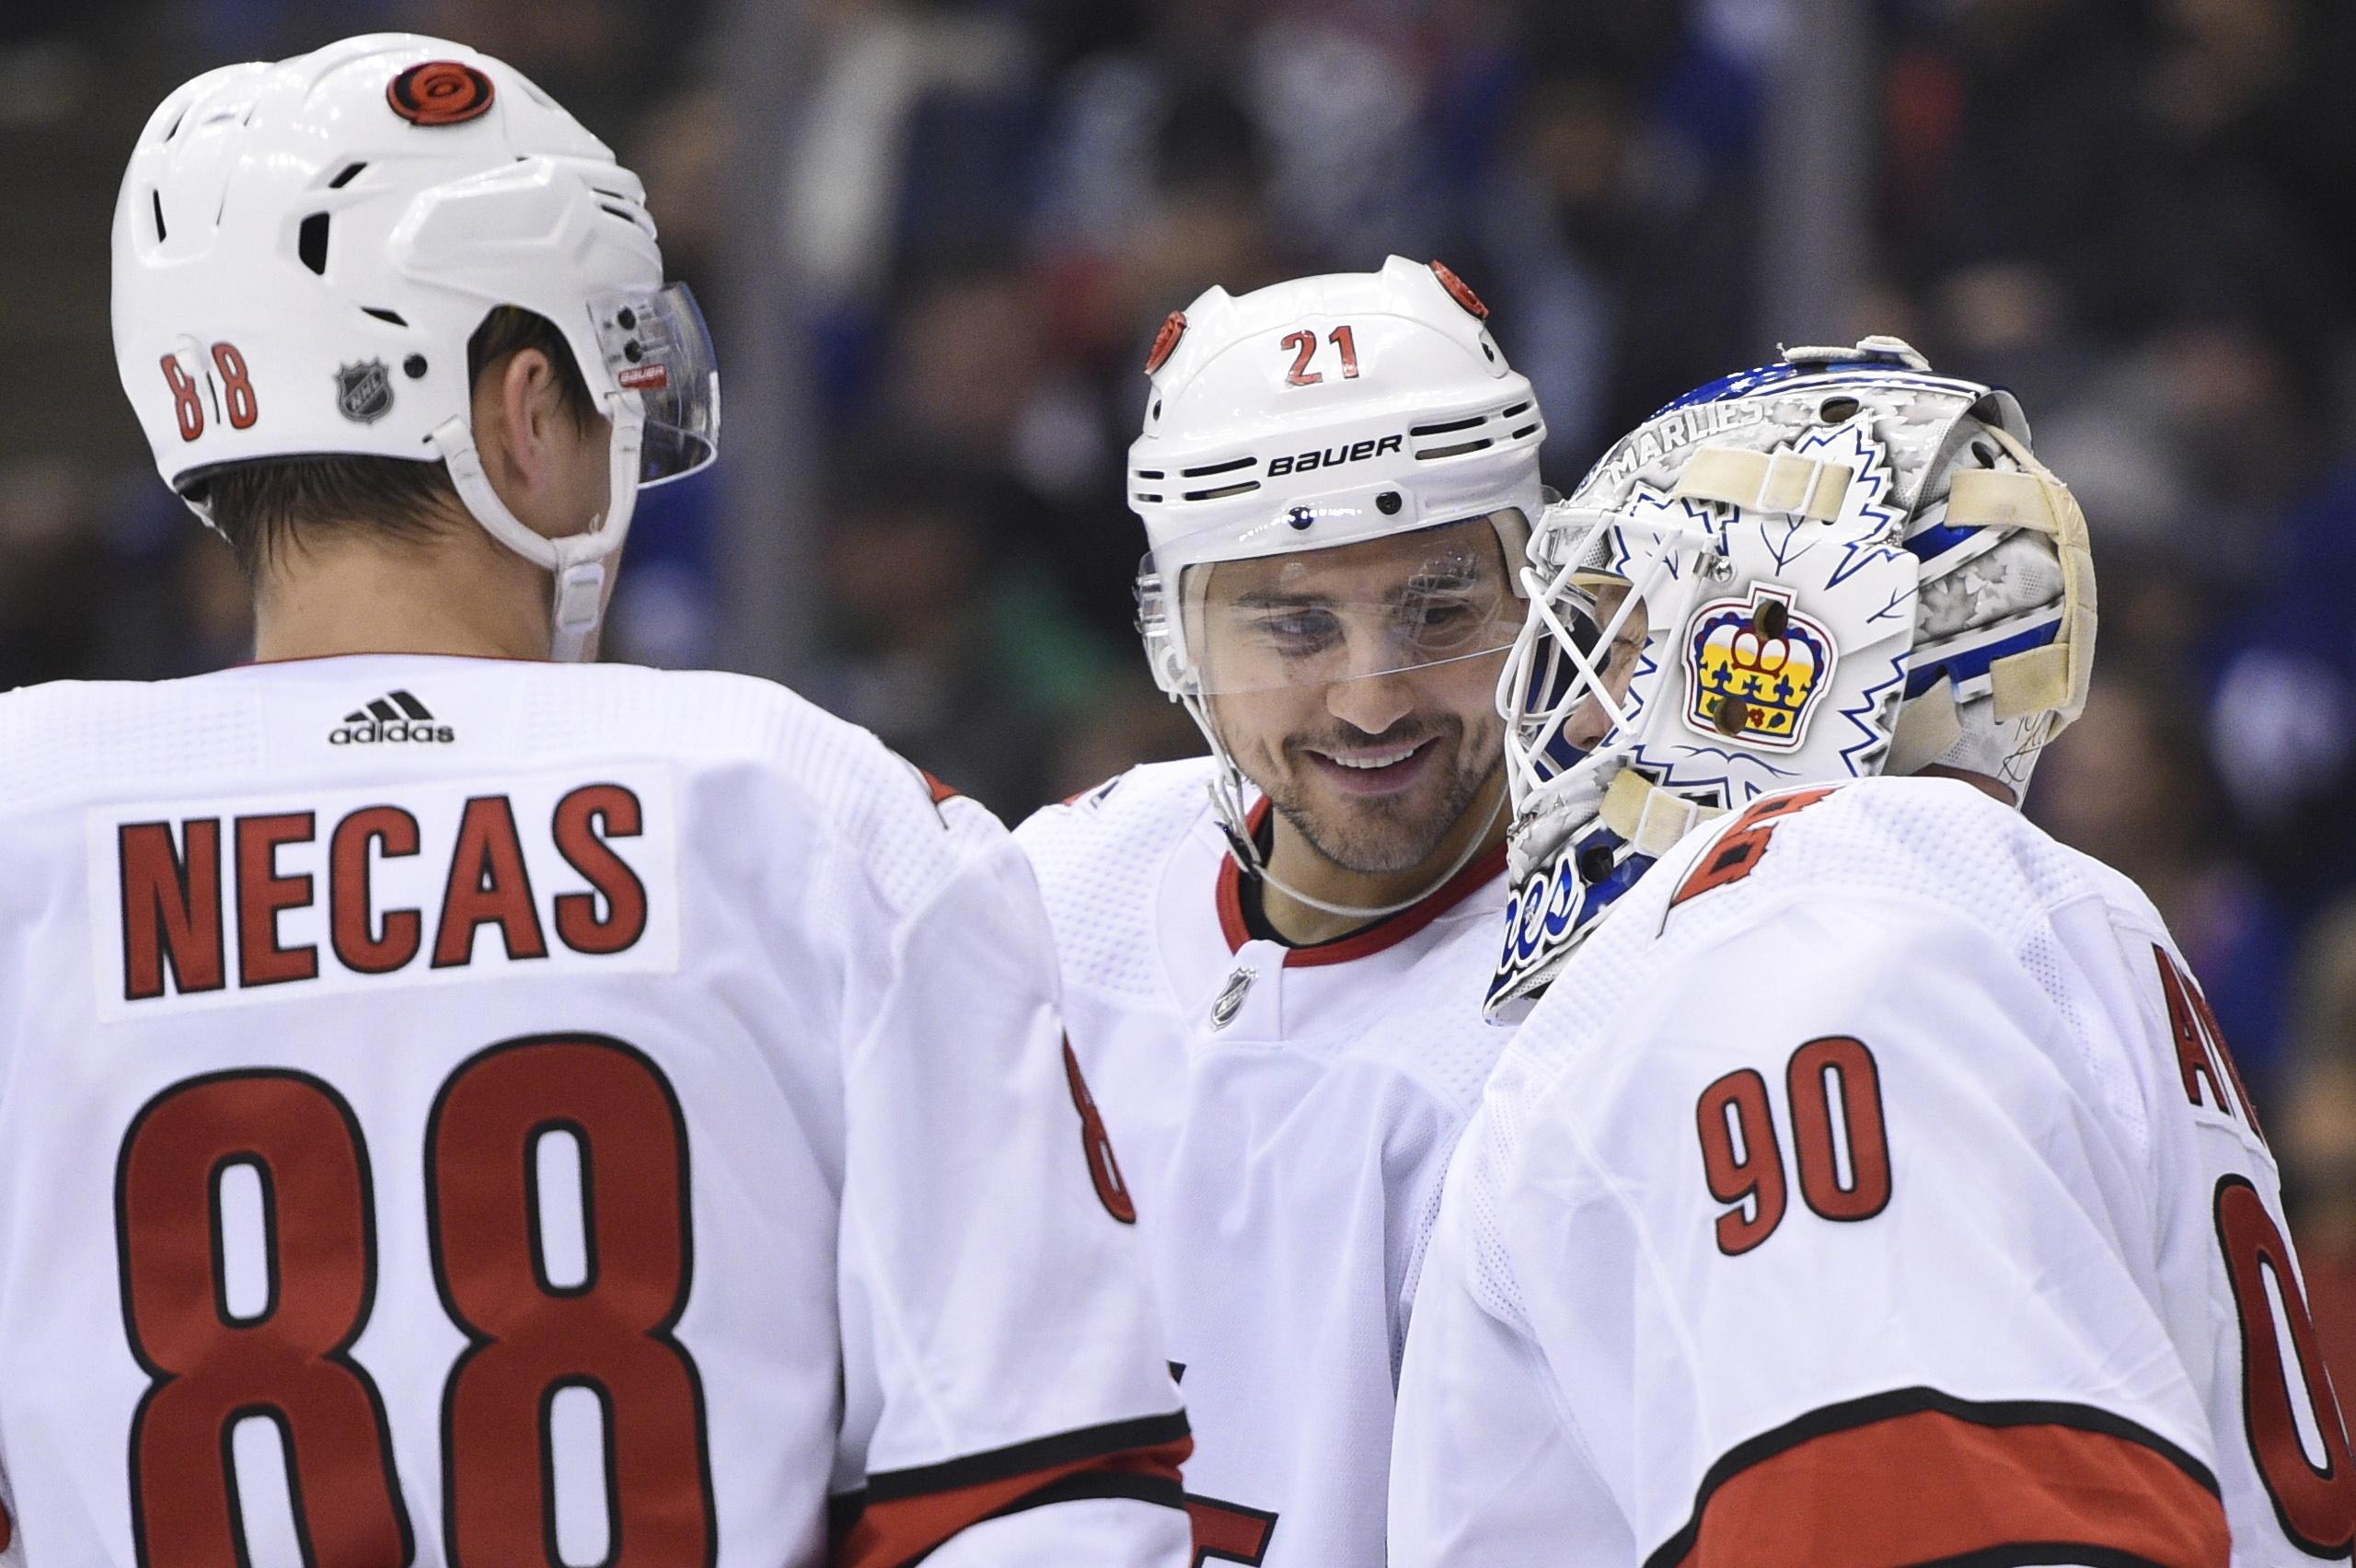 Carolina Hurricanes Emergency Backup Goalie Beats Toronto Maple Leafs